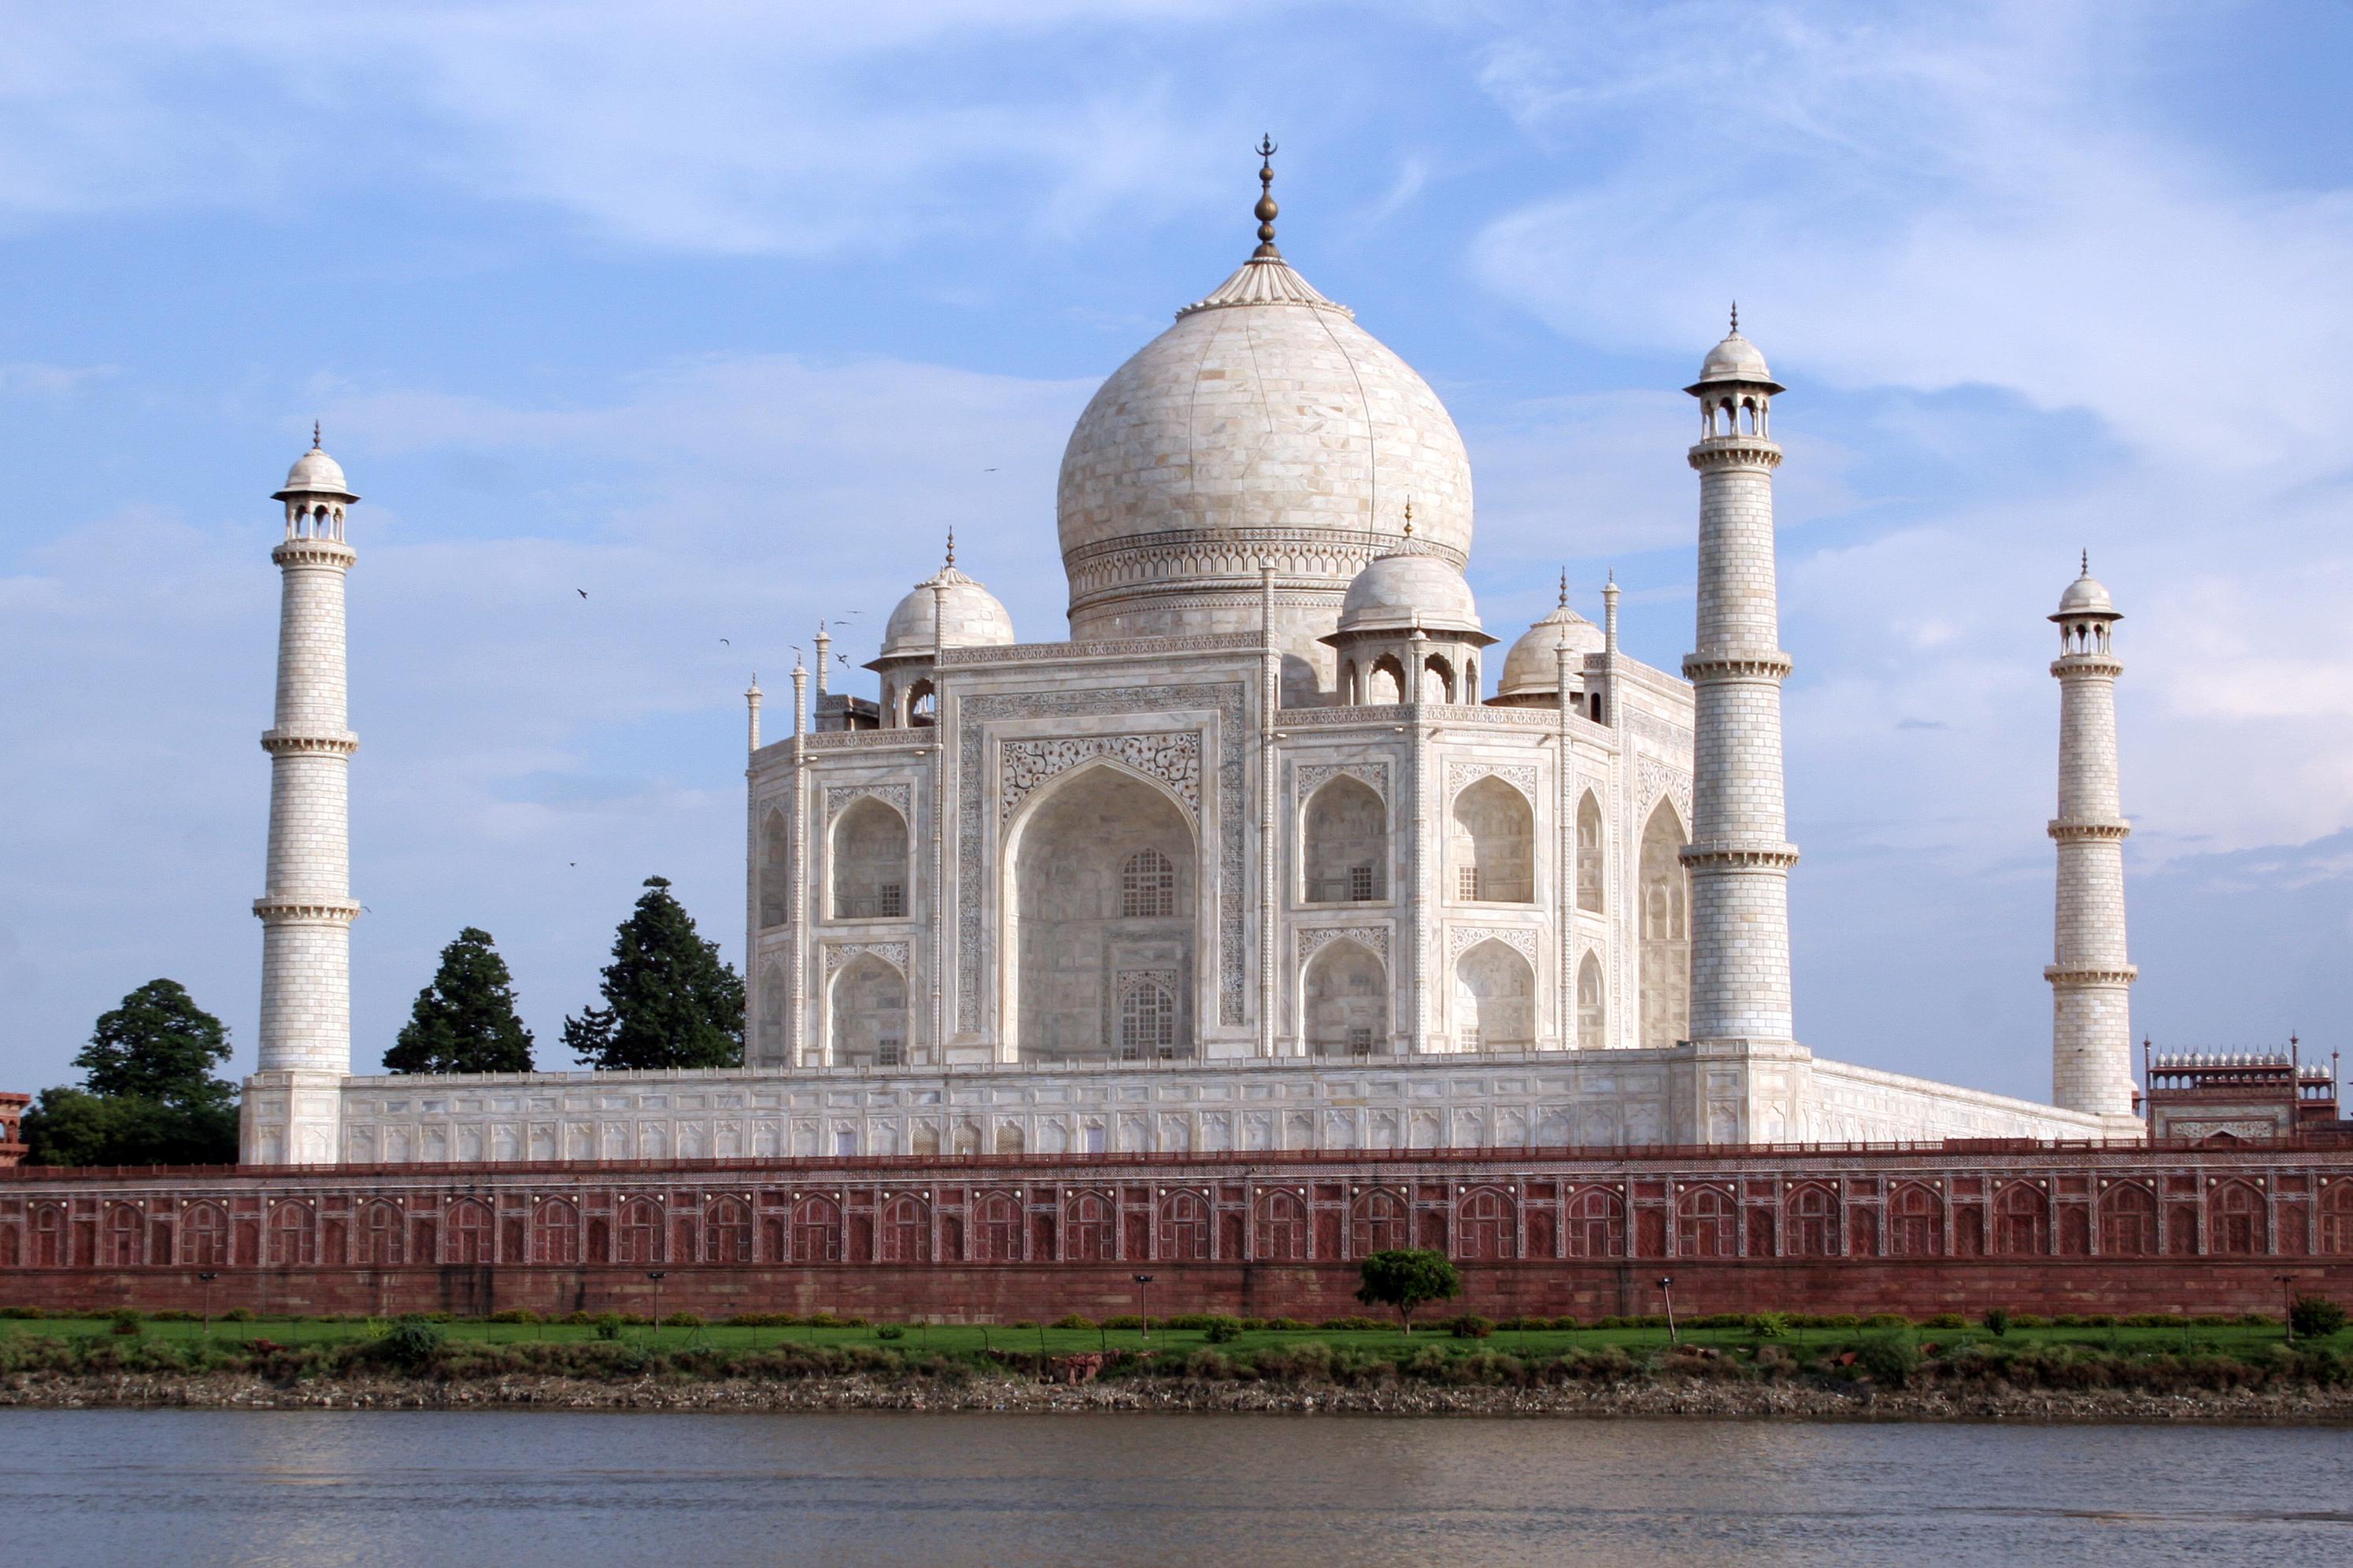 information on taj mahal in hindi Taj mahal, taj mahal history, taj mahal location, pictures, information, taj mahal tours, tickets and packages taj mahal india.